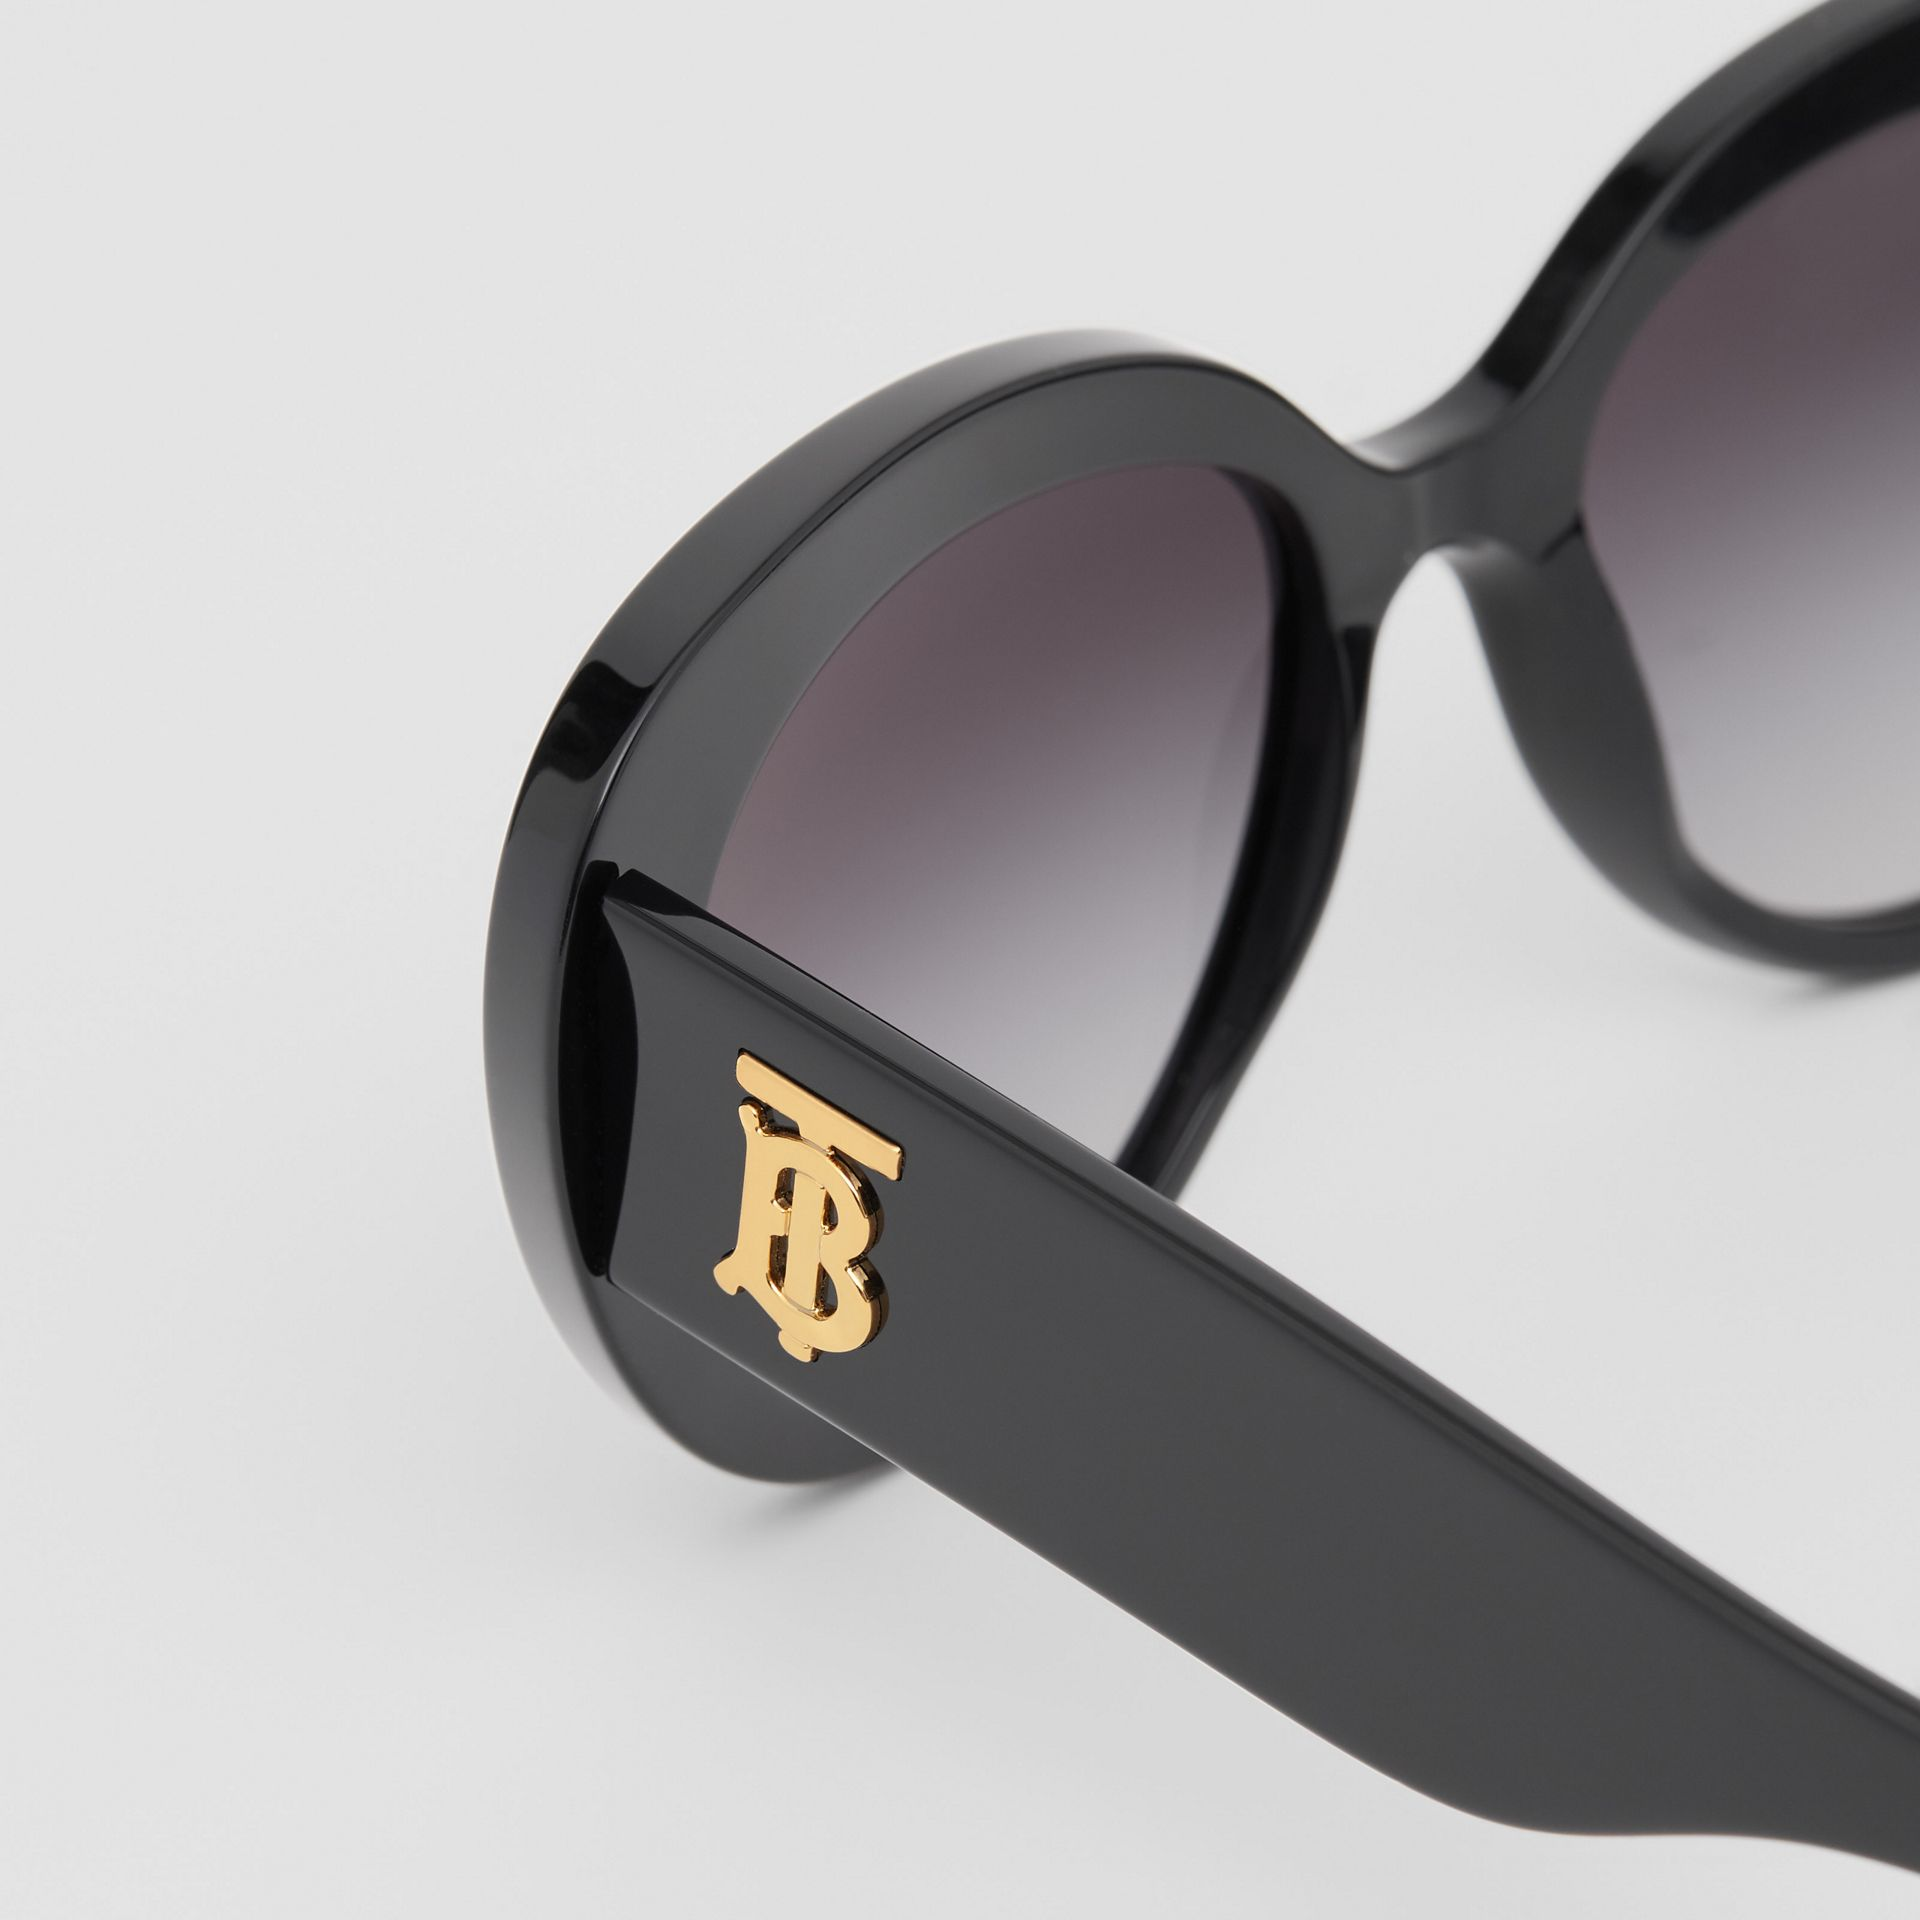 Monogram Motif Cat-eye Frame Sunglasses in Black - Women | Burberry United Kingdom - gallery image 1